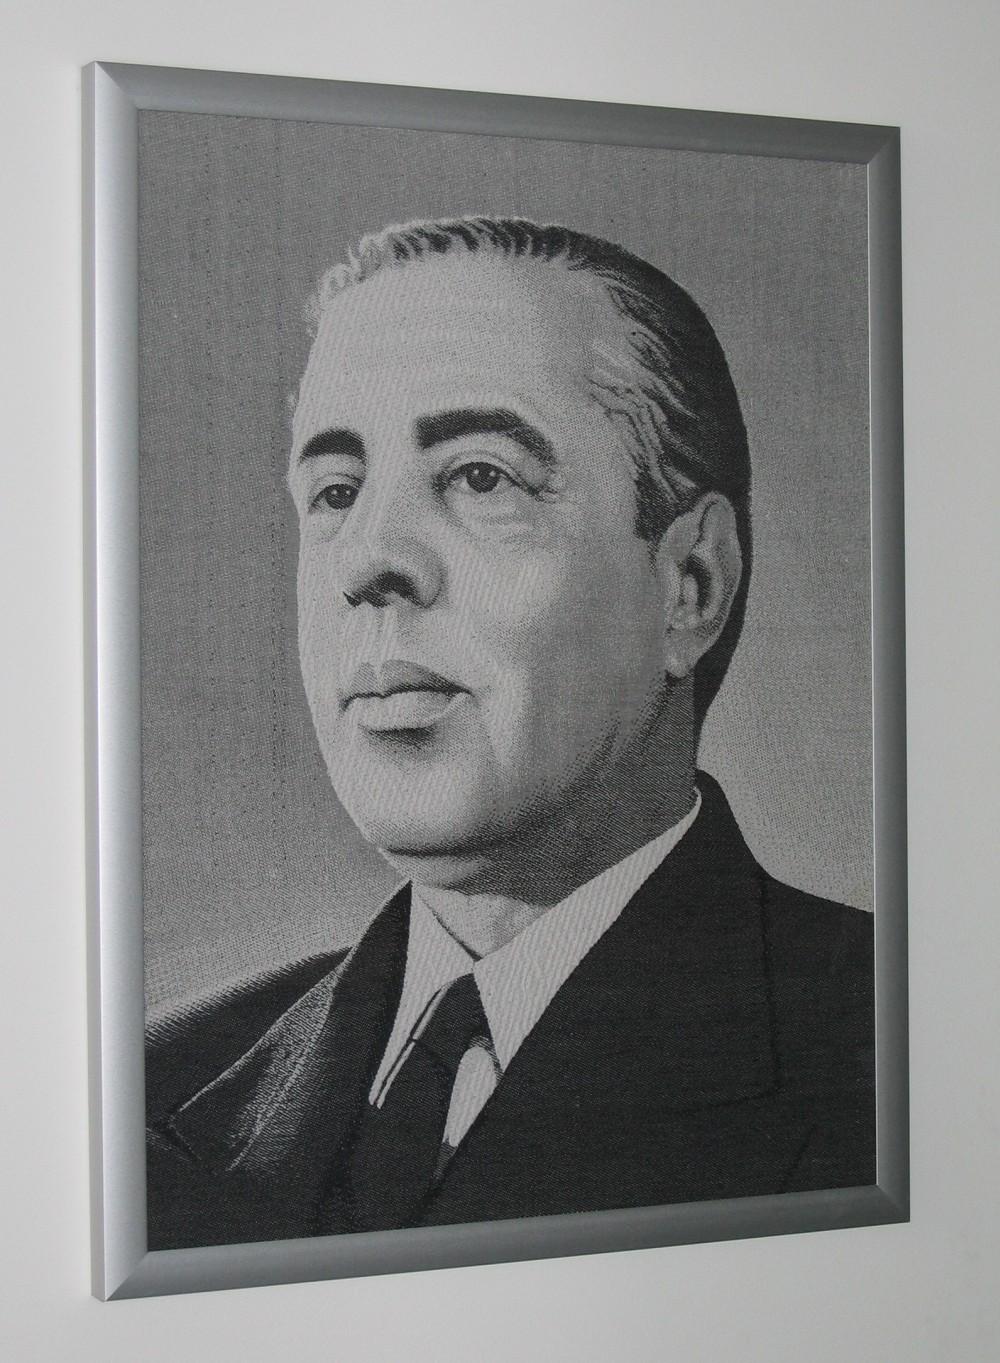 Портрет вышивка на ткани